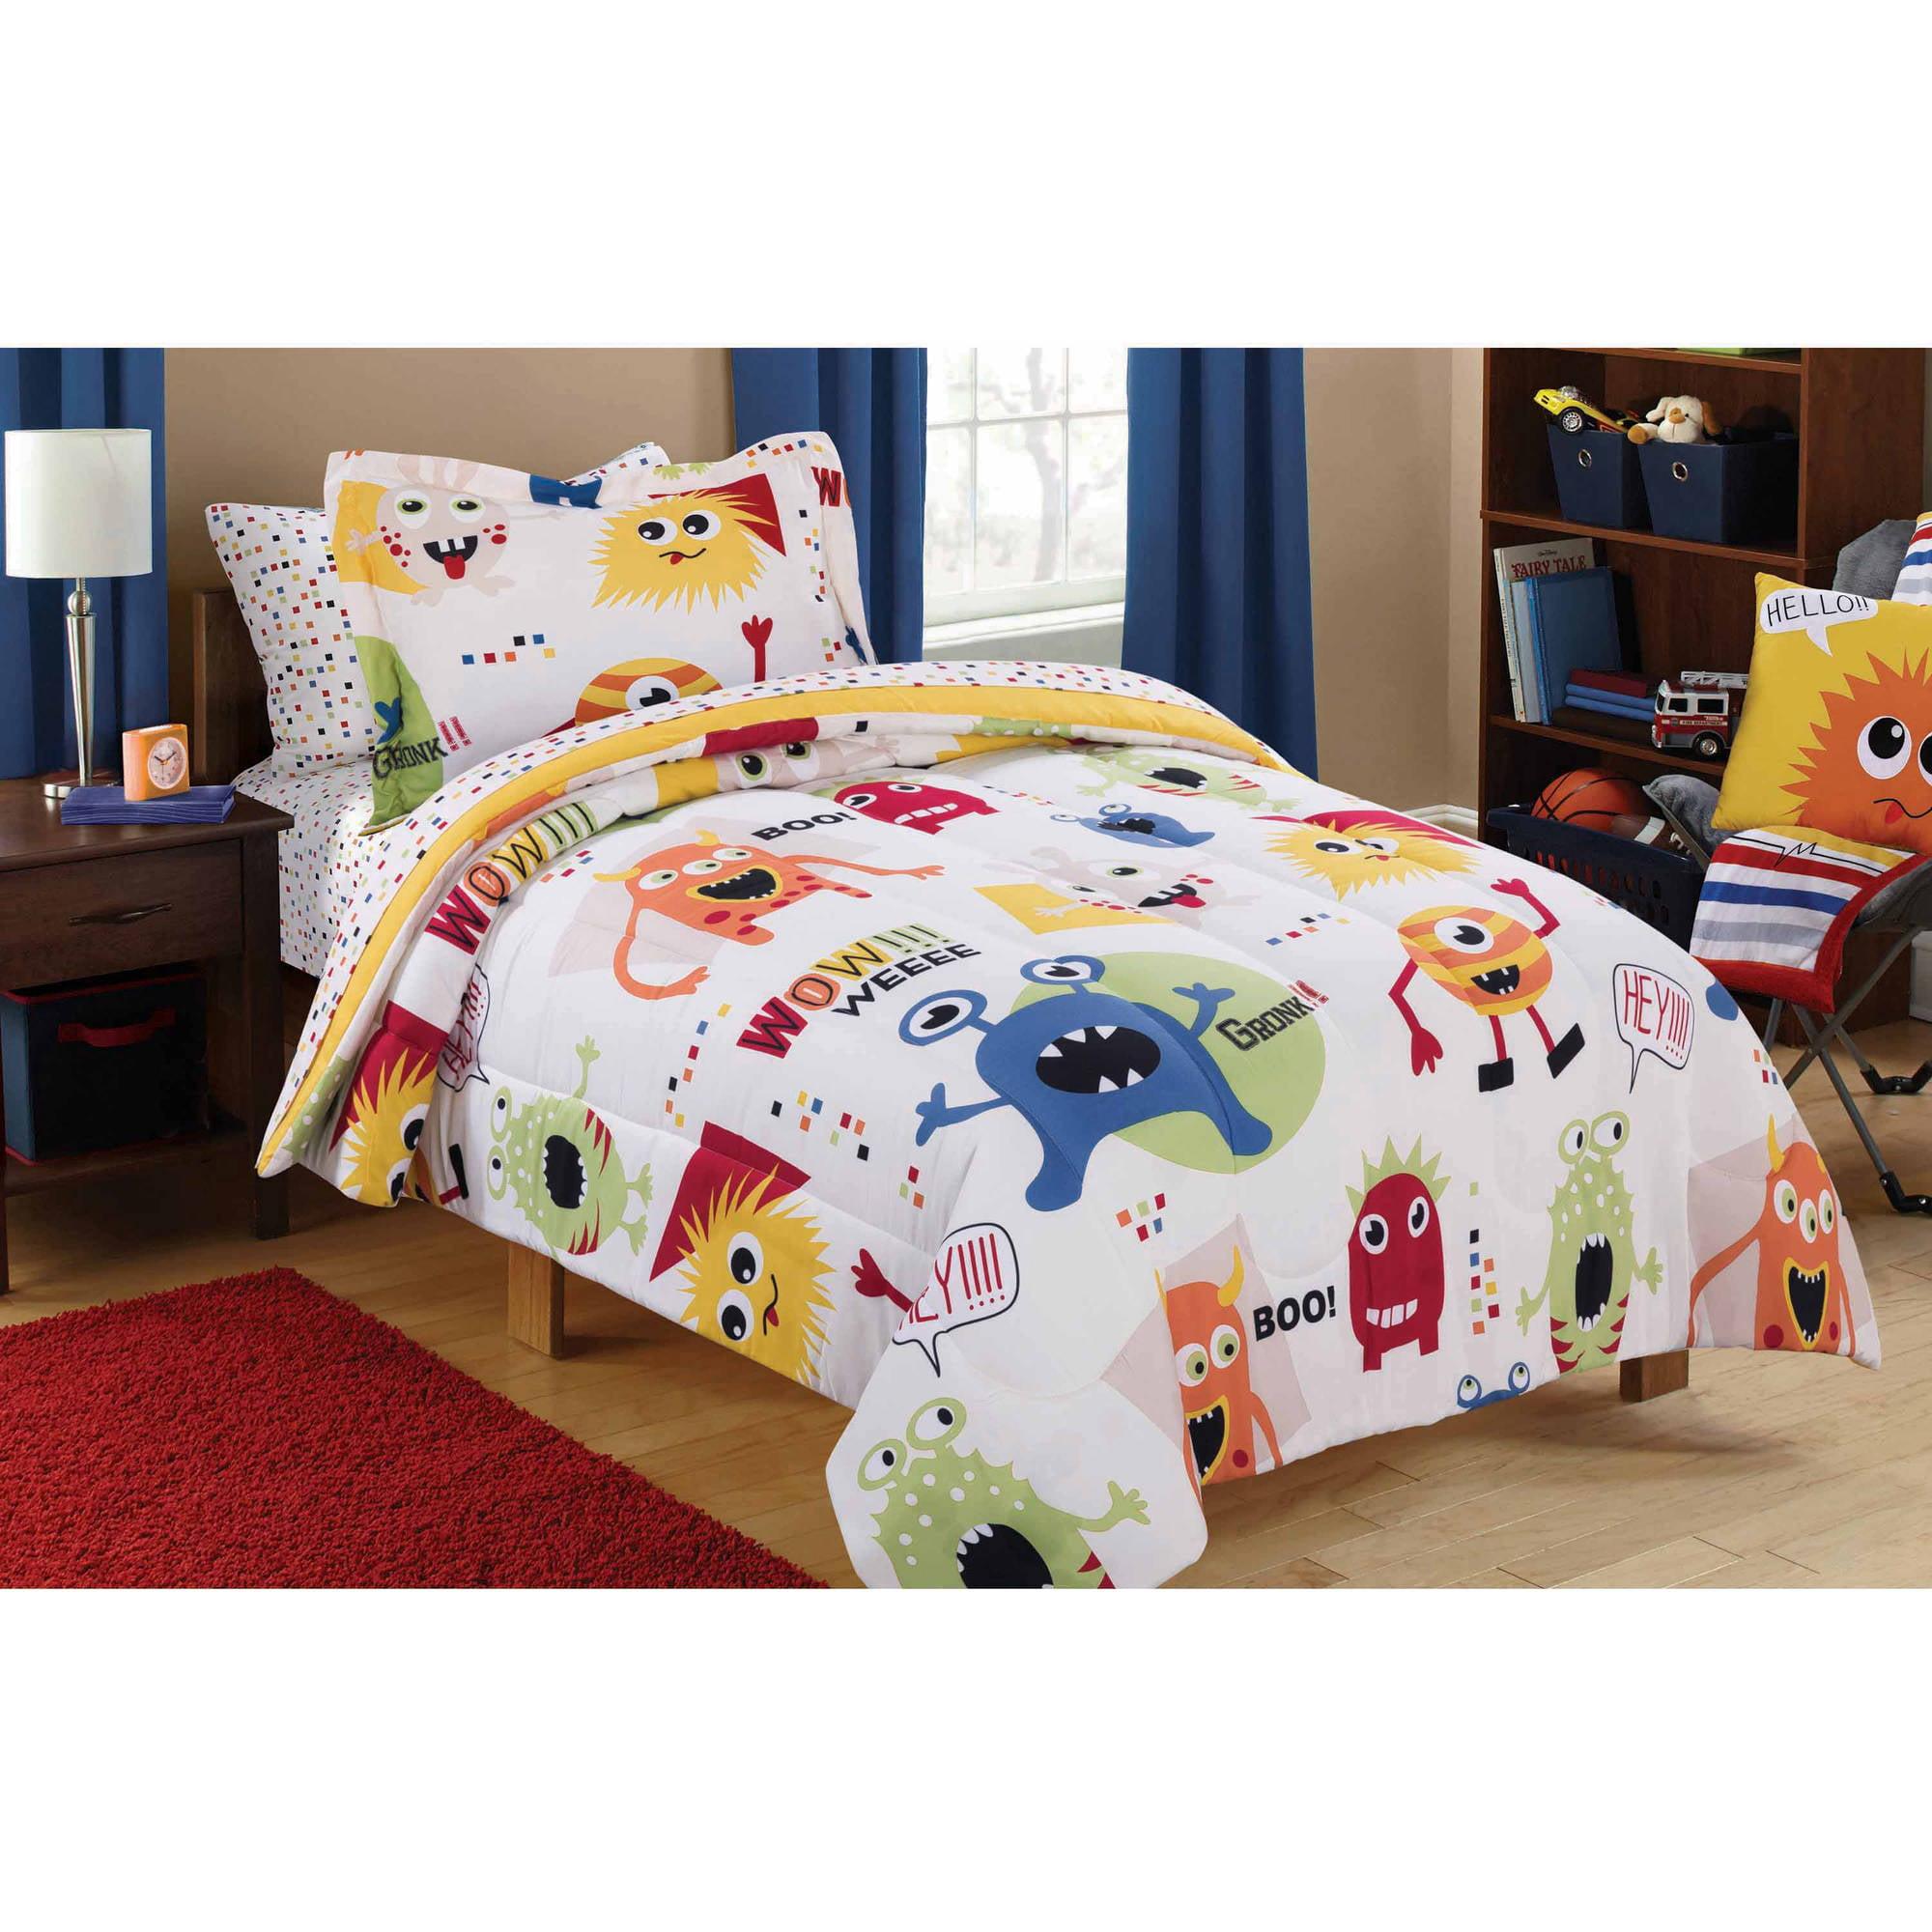 Mainstays Kids Monster Mix Bed in a Bag Bedding Set